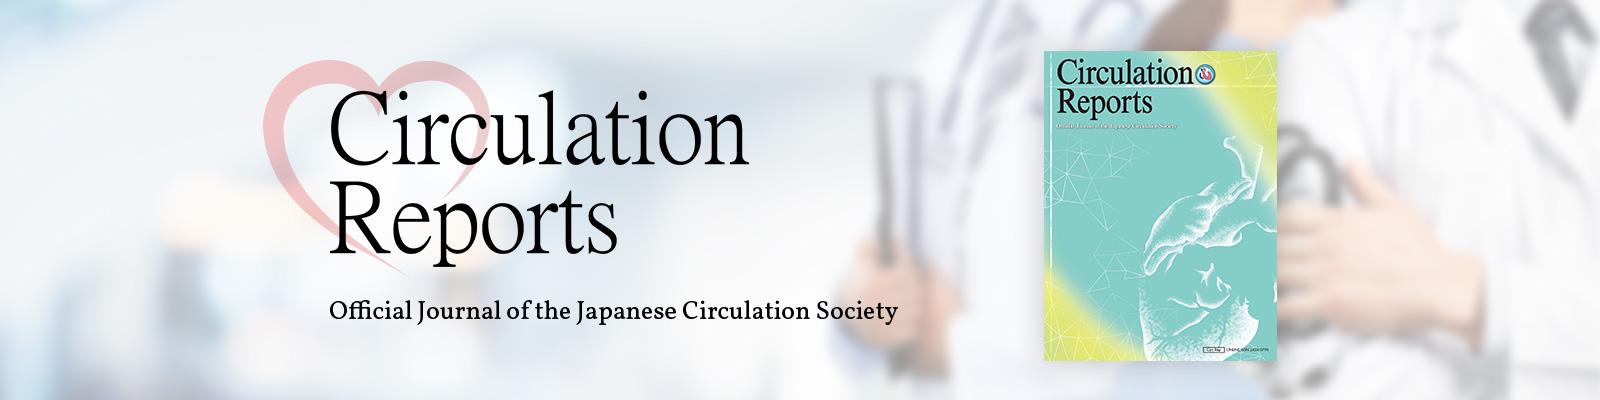 Circulation Reports